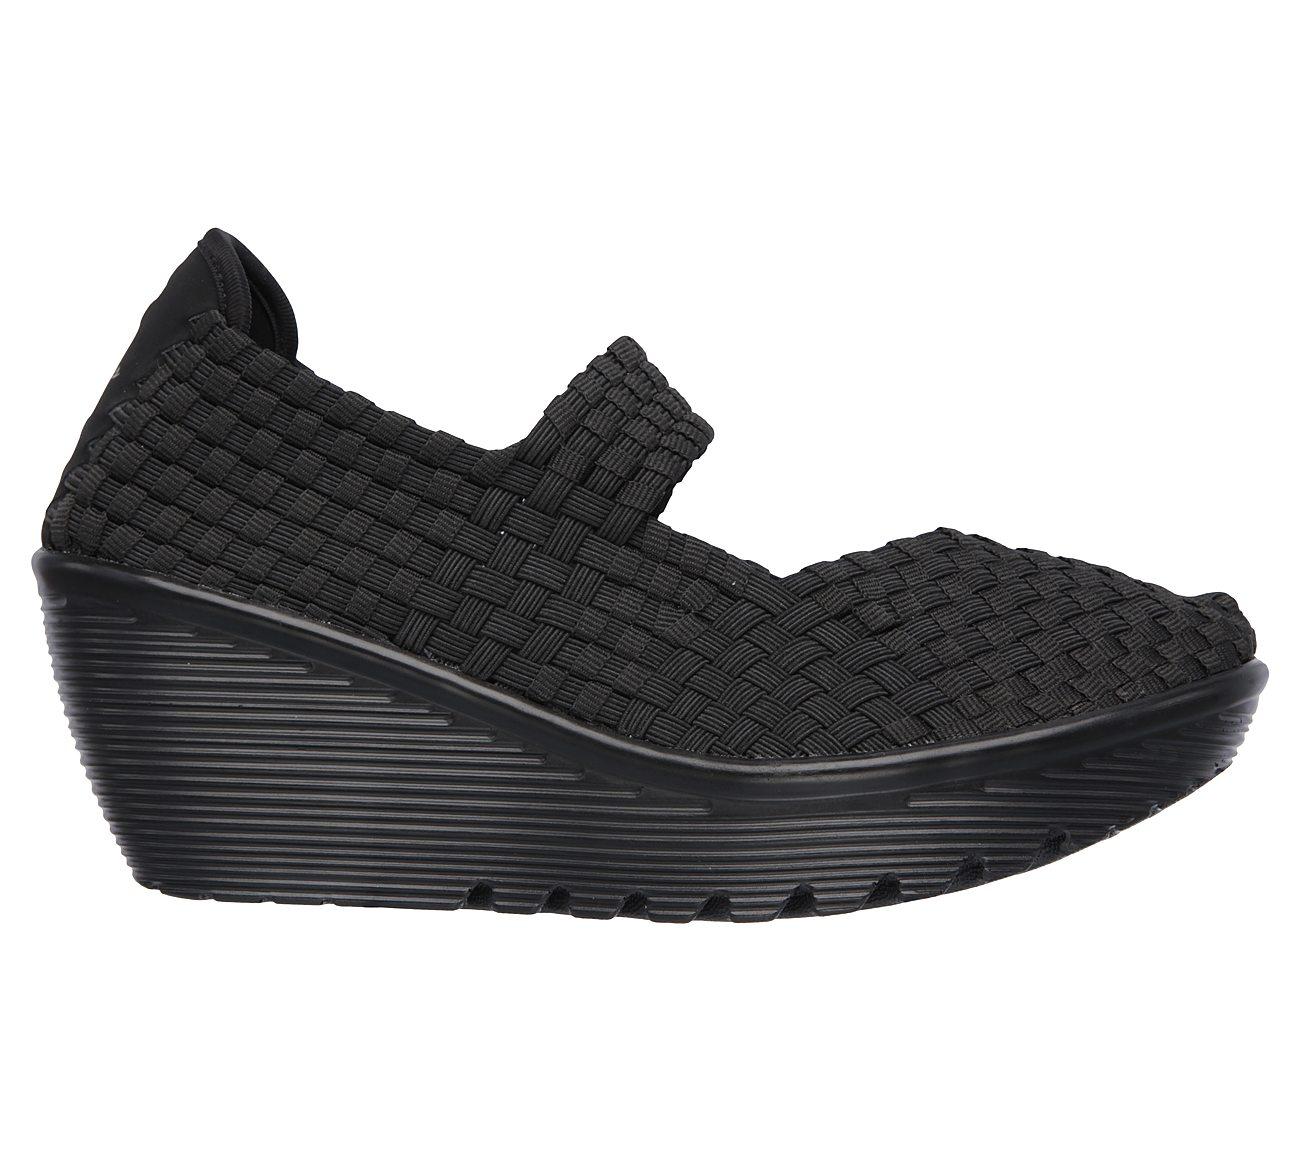 skechers shoes with heels